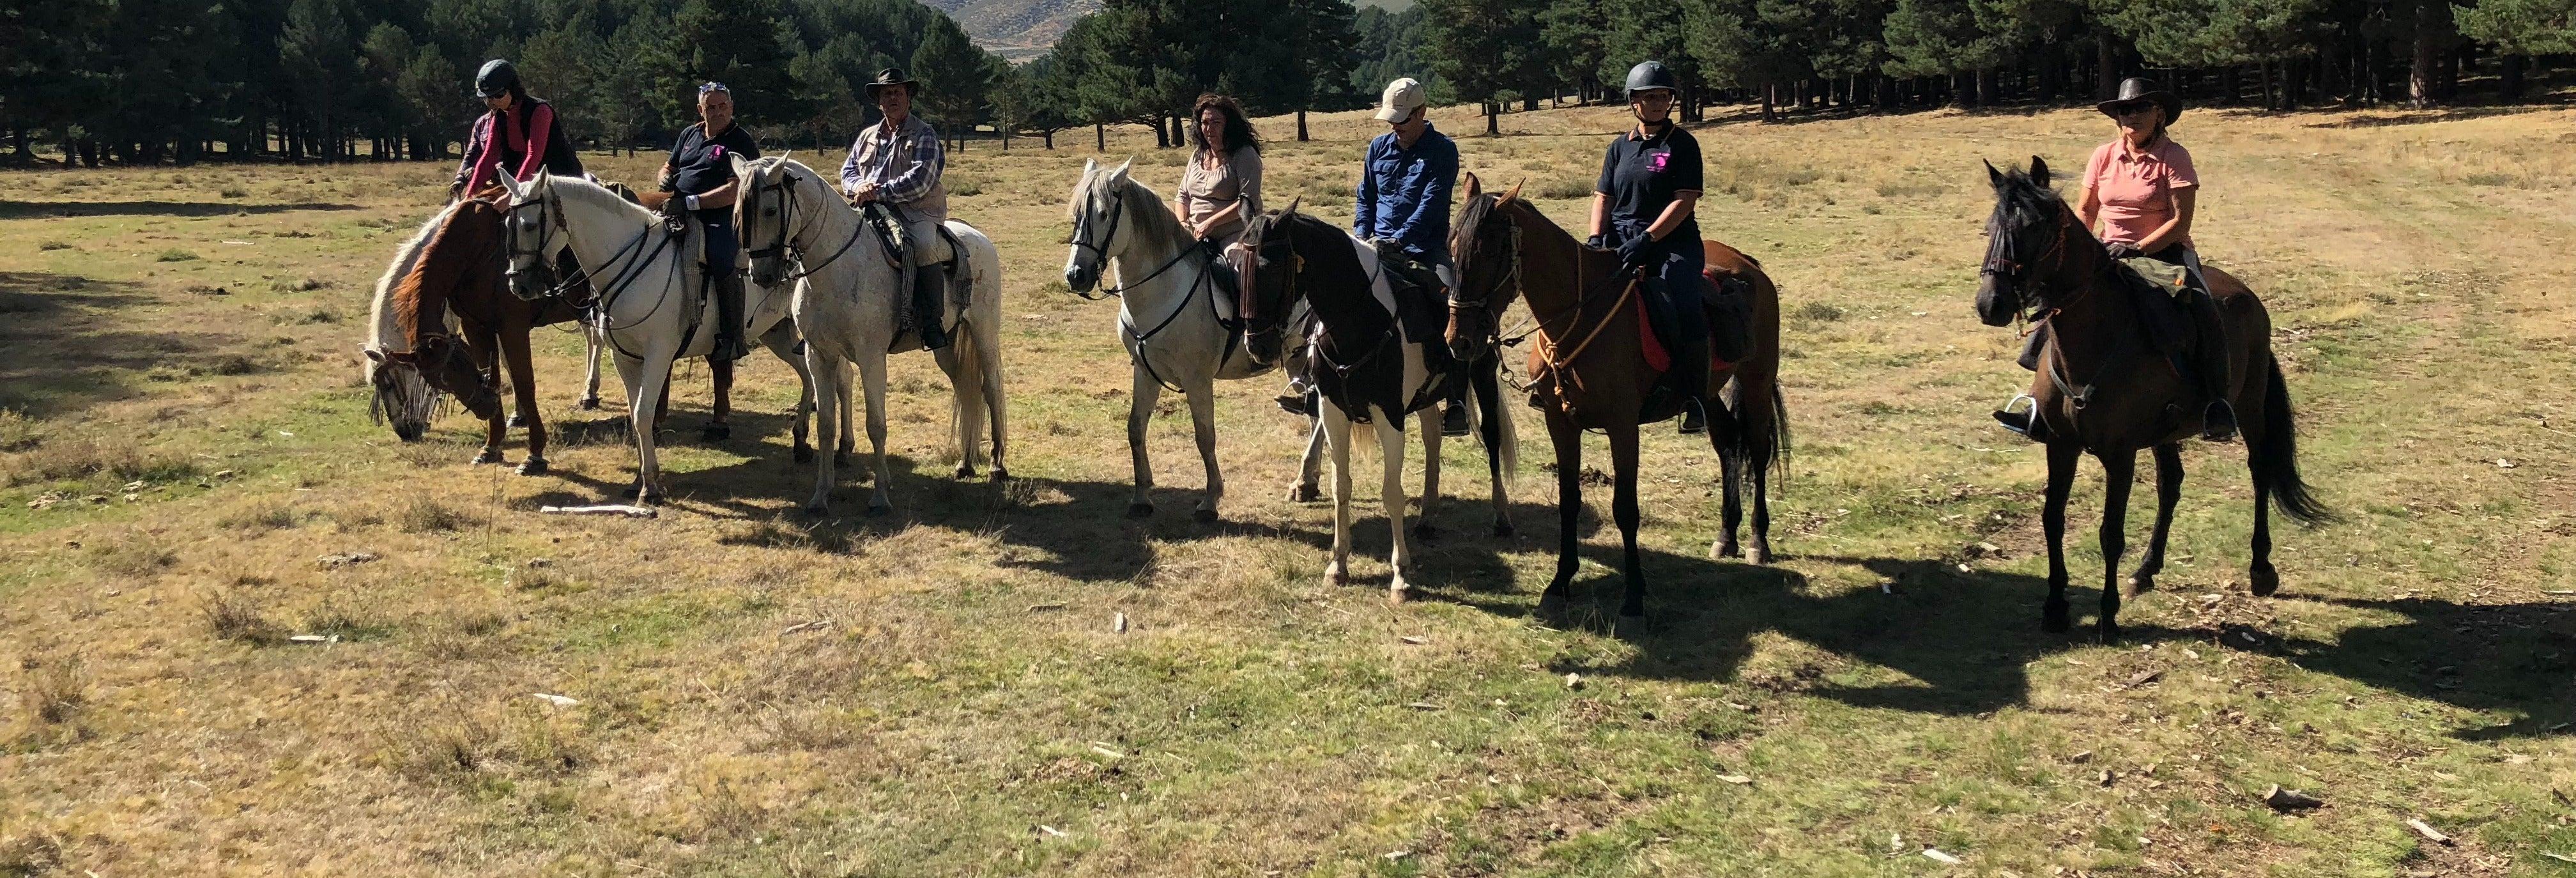 Paseo a caballo por el valle del Tiétar